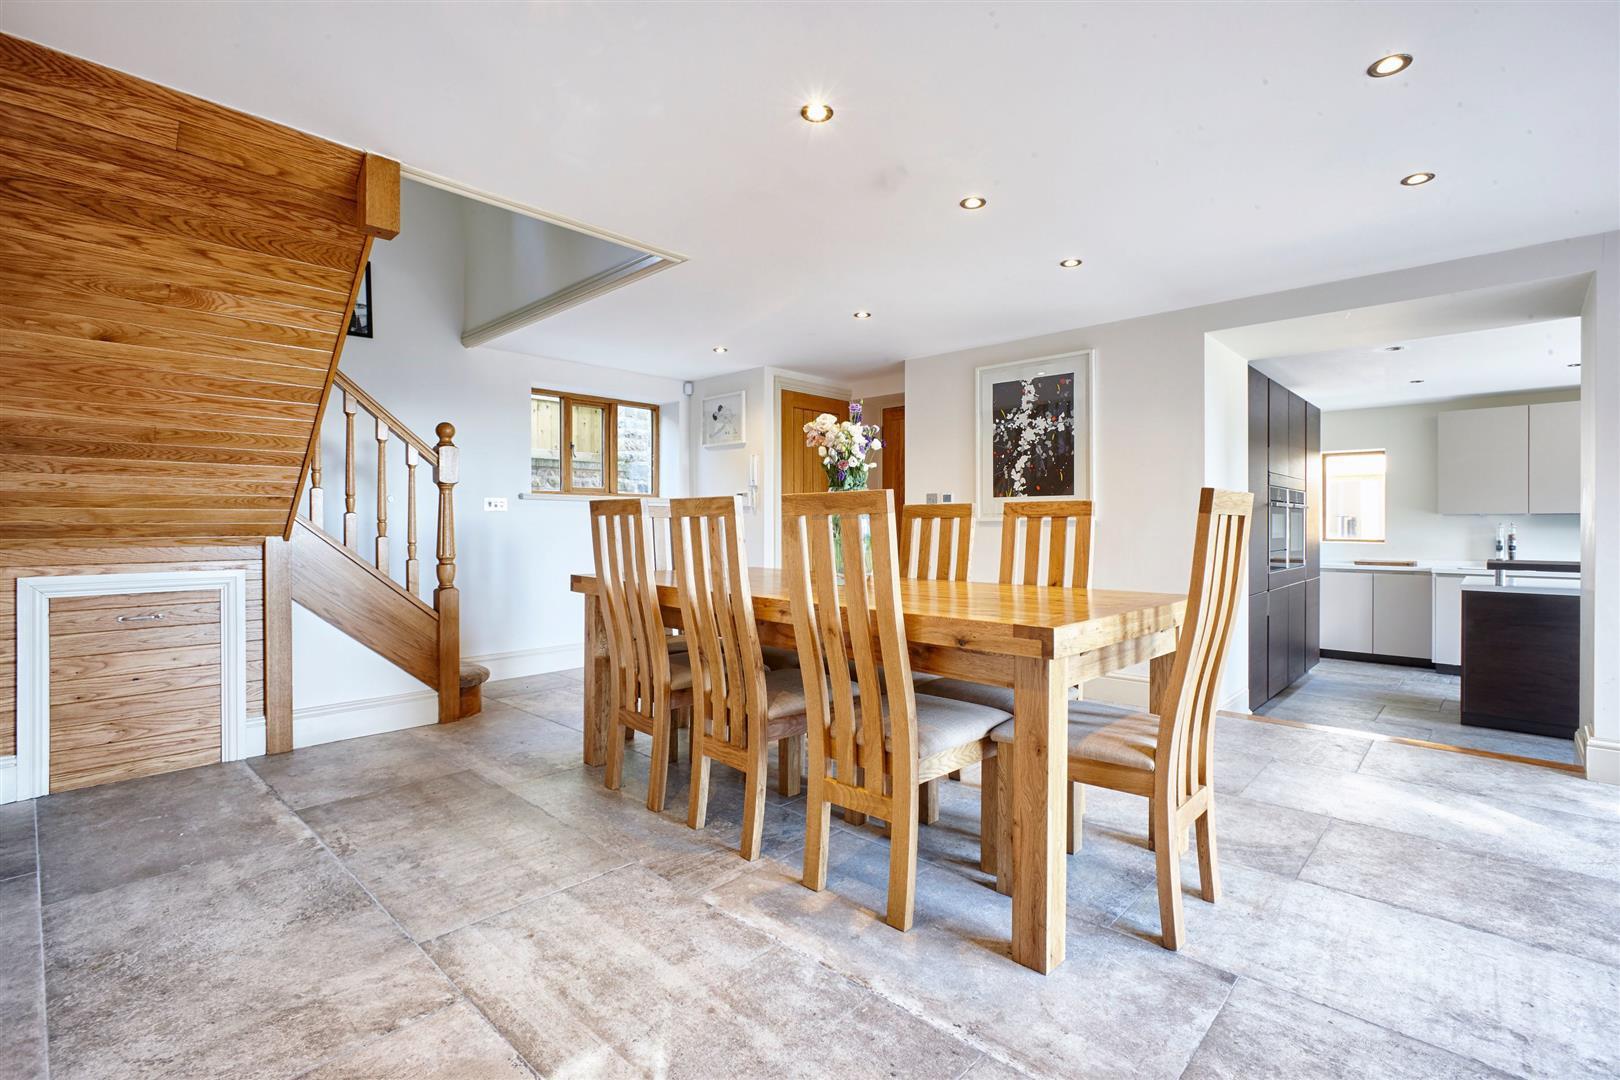 4 Bedroom Detached House For Sale - Farmhouse 8